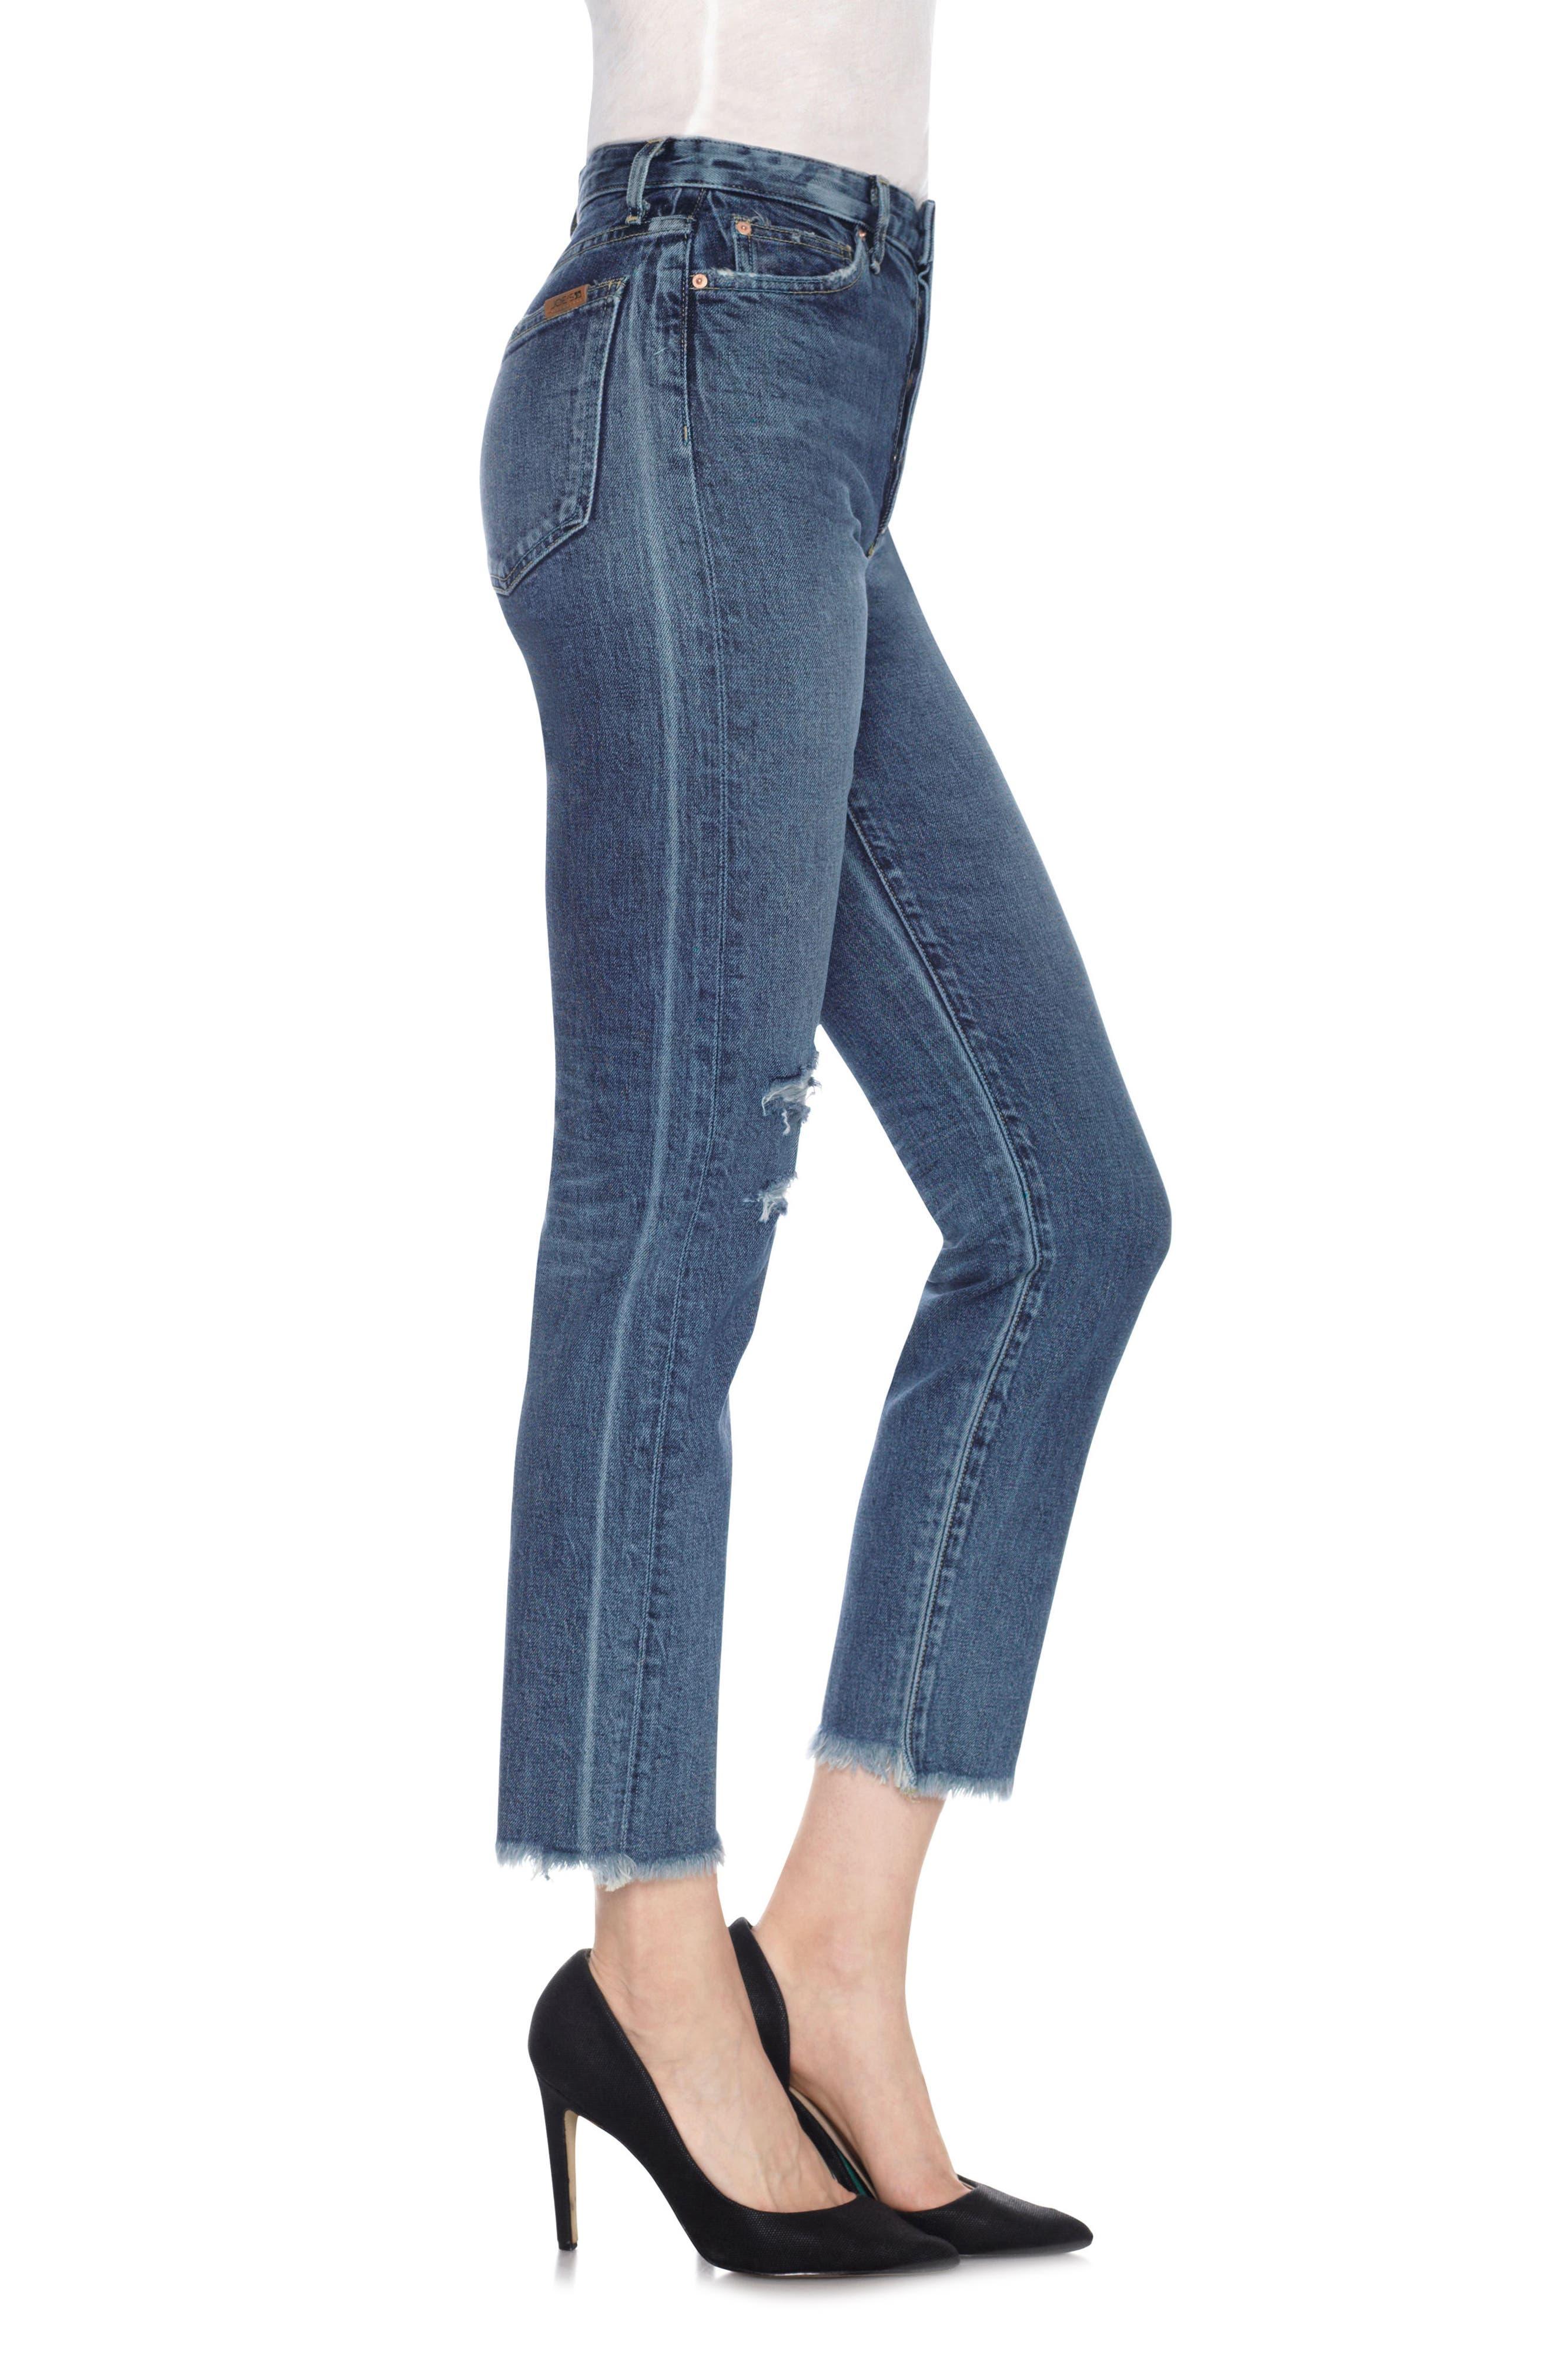 Taylor Hill x Joe's Debbie High Rise Ankle Jeans,                             Alternate thumbnail 3, color,                             Julee